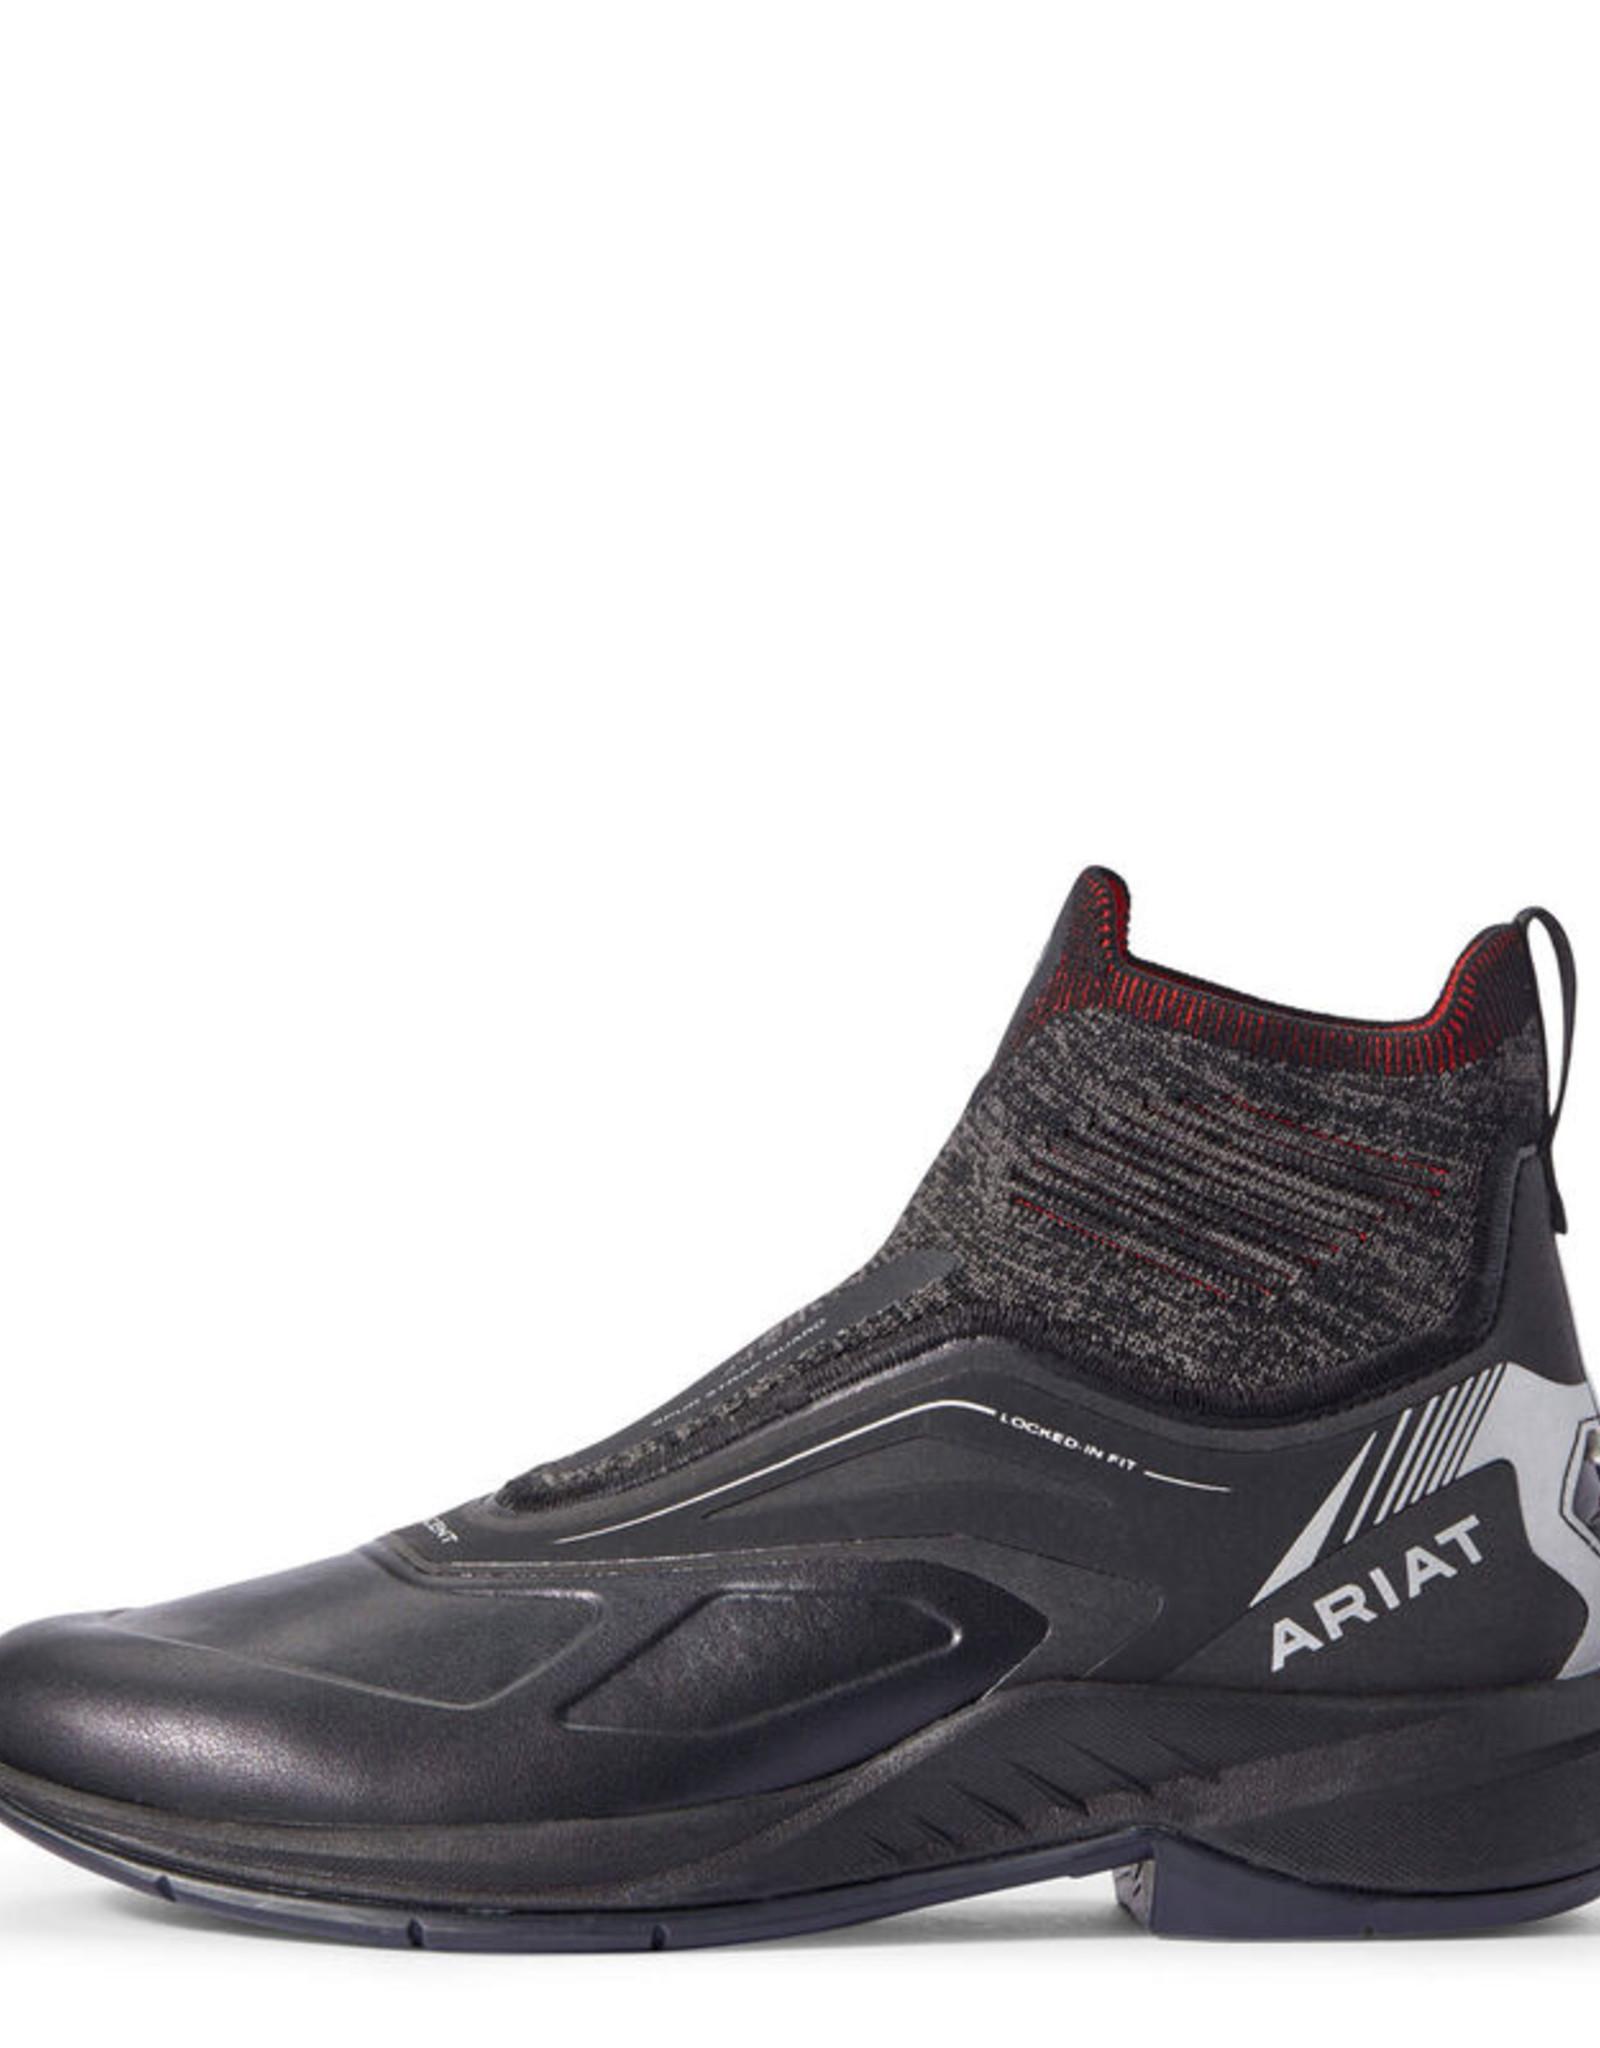 Ariat Ladies' Ascent Paddock Boot